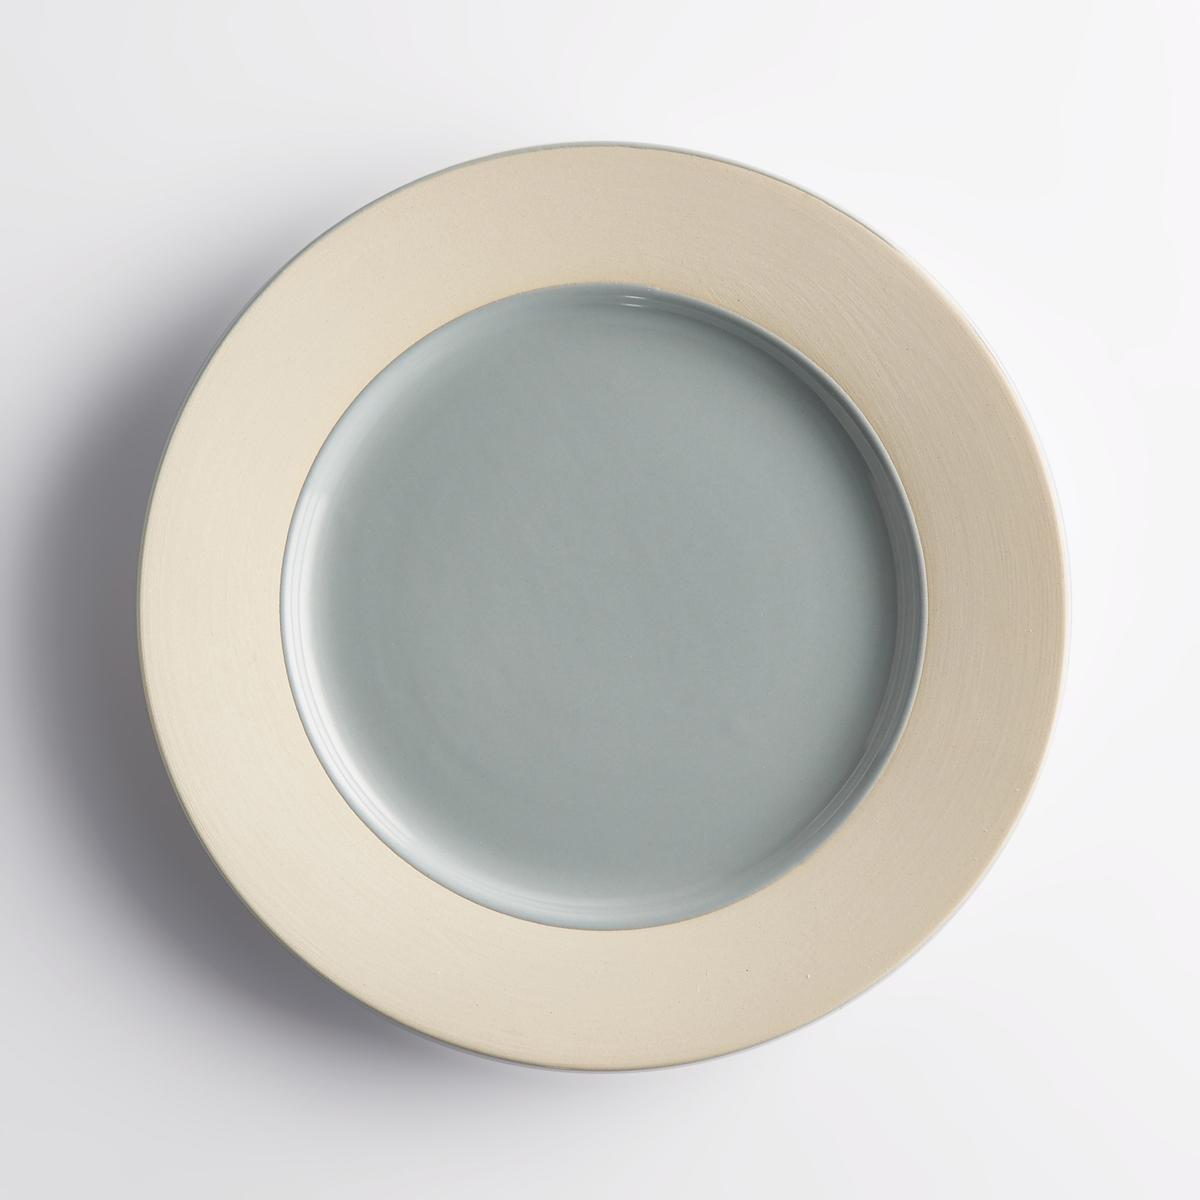 Комплект из 4 мелких тарелок из керамики Warota